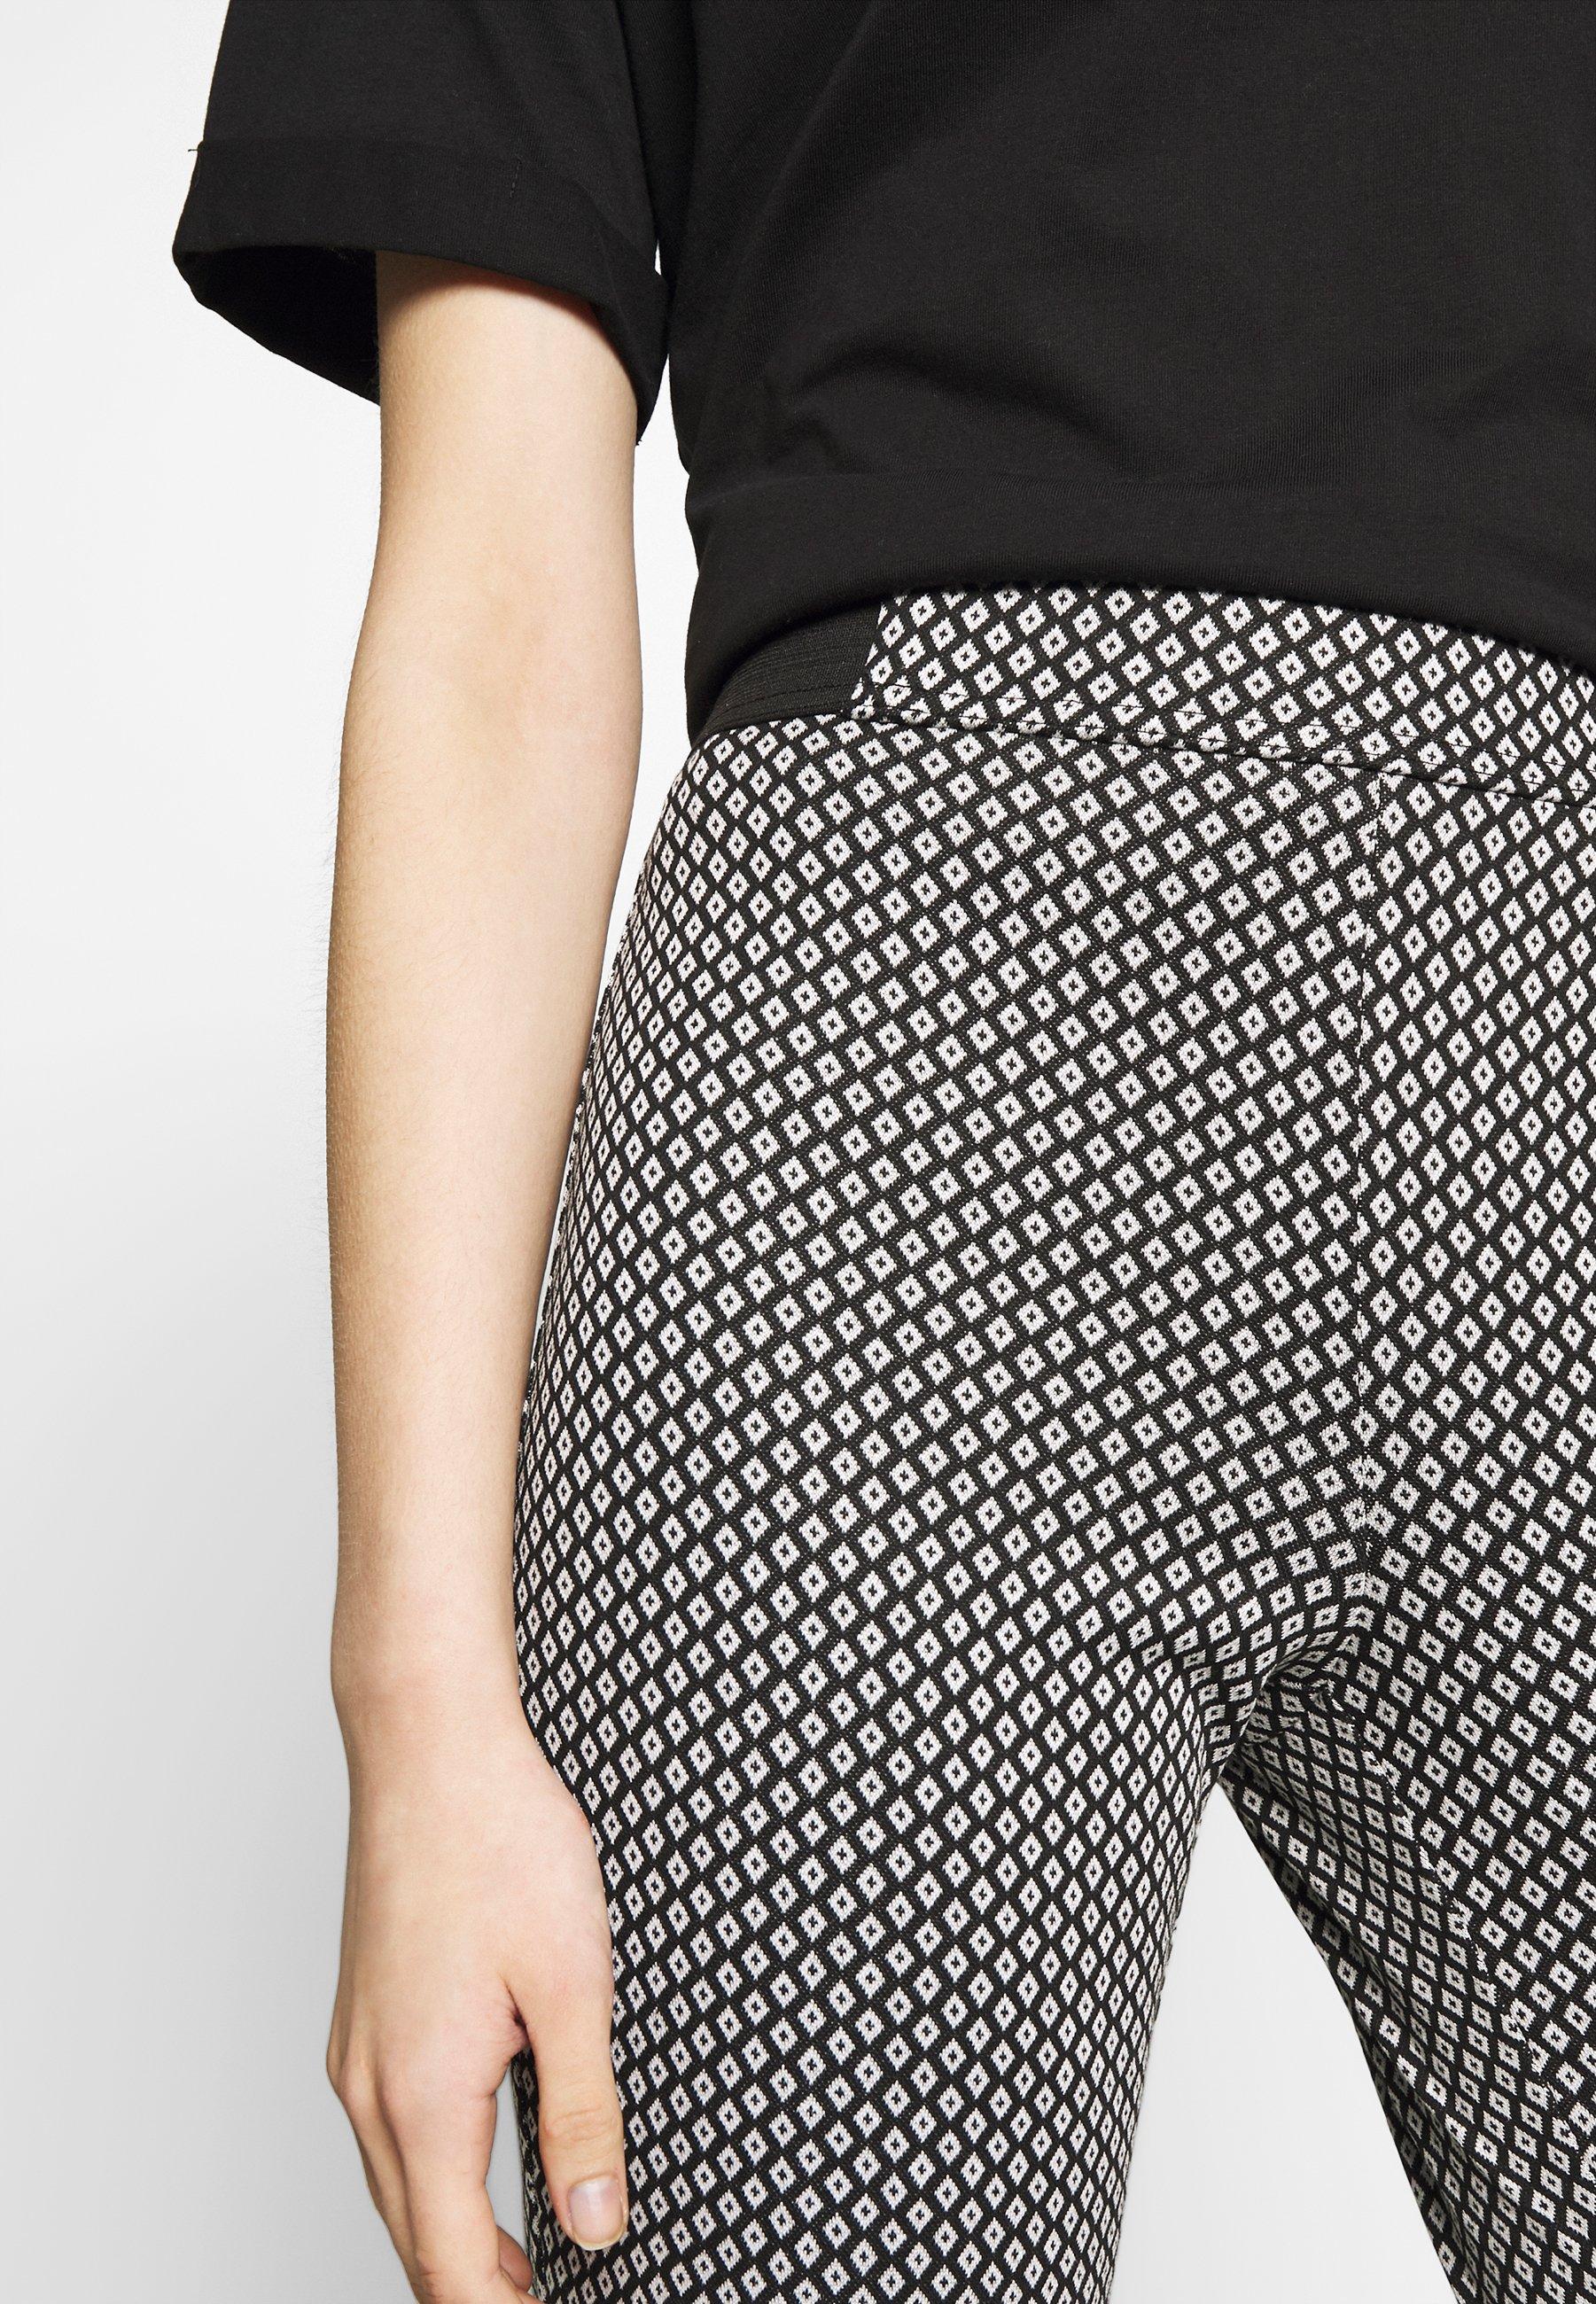 Dorothy Perkins Tapered Trouser - Pantalon Classique Black/white